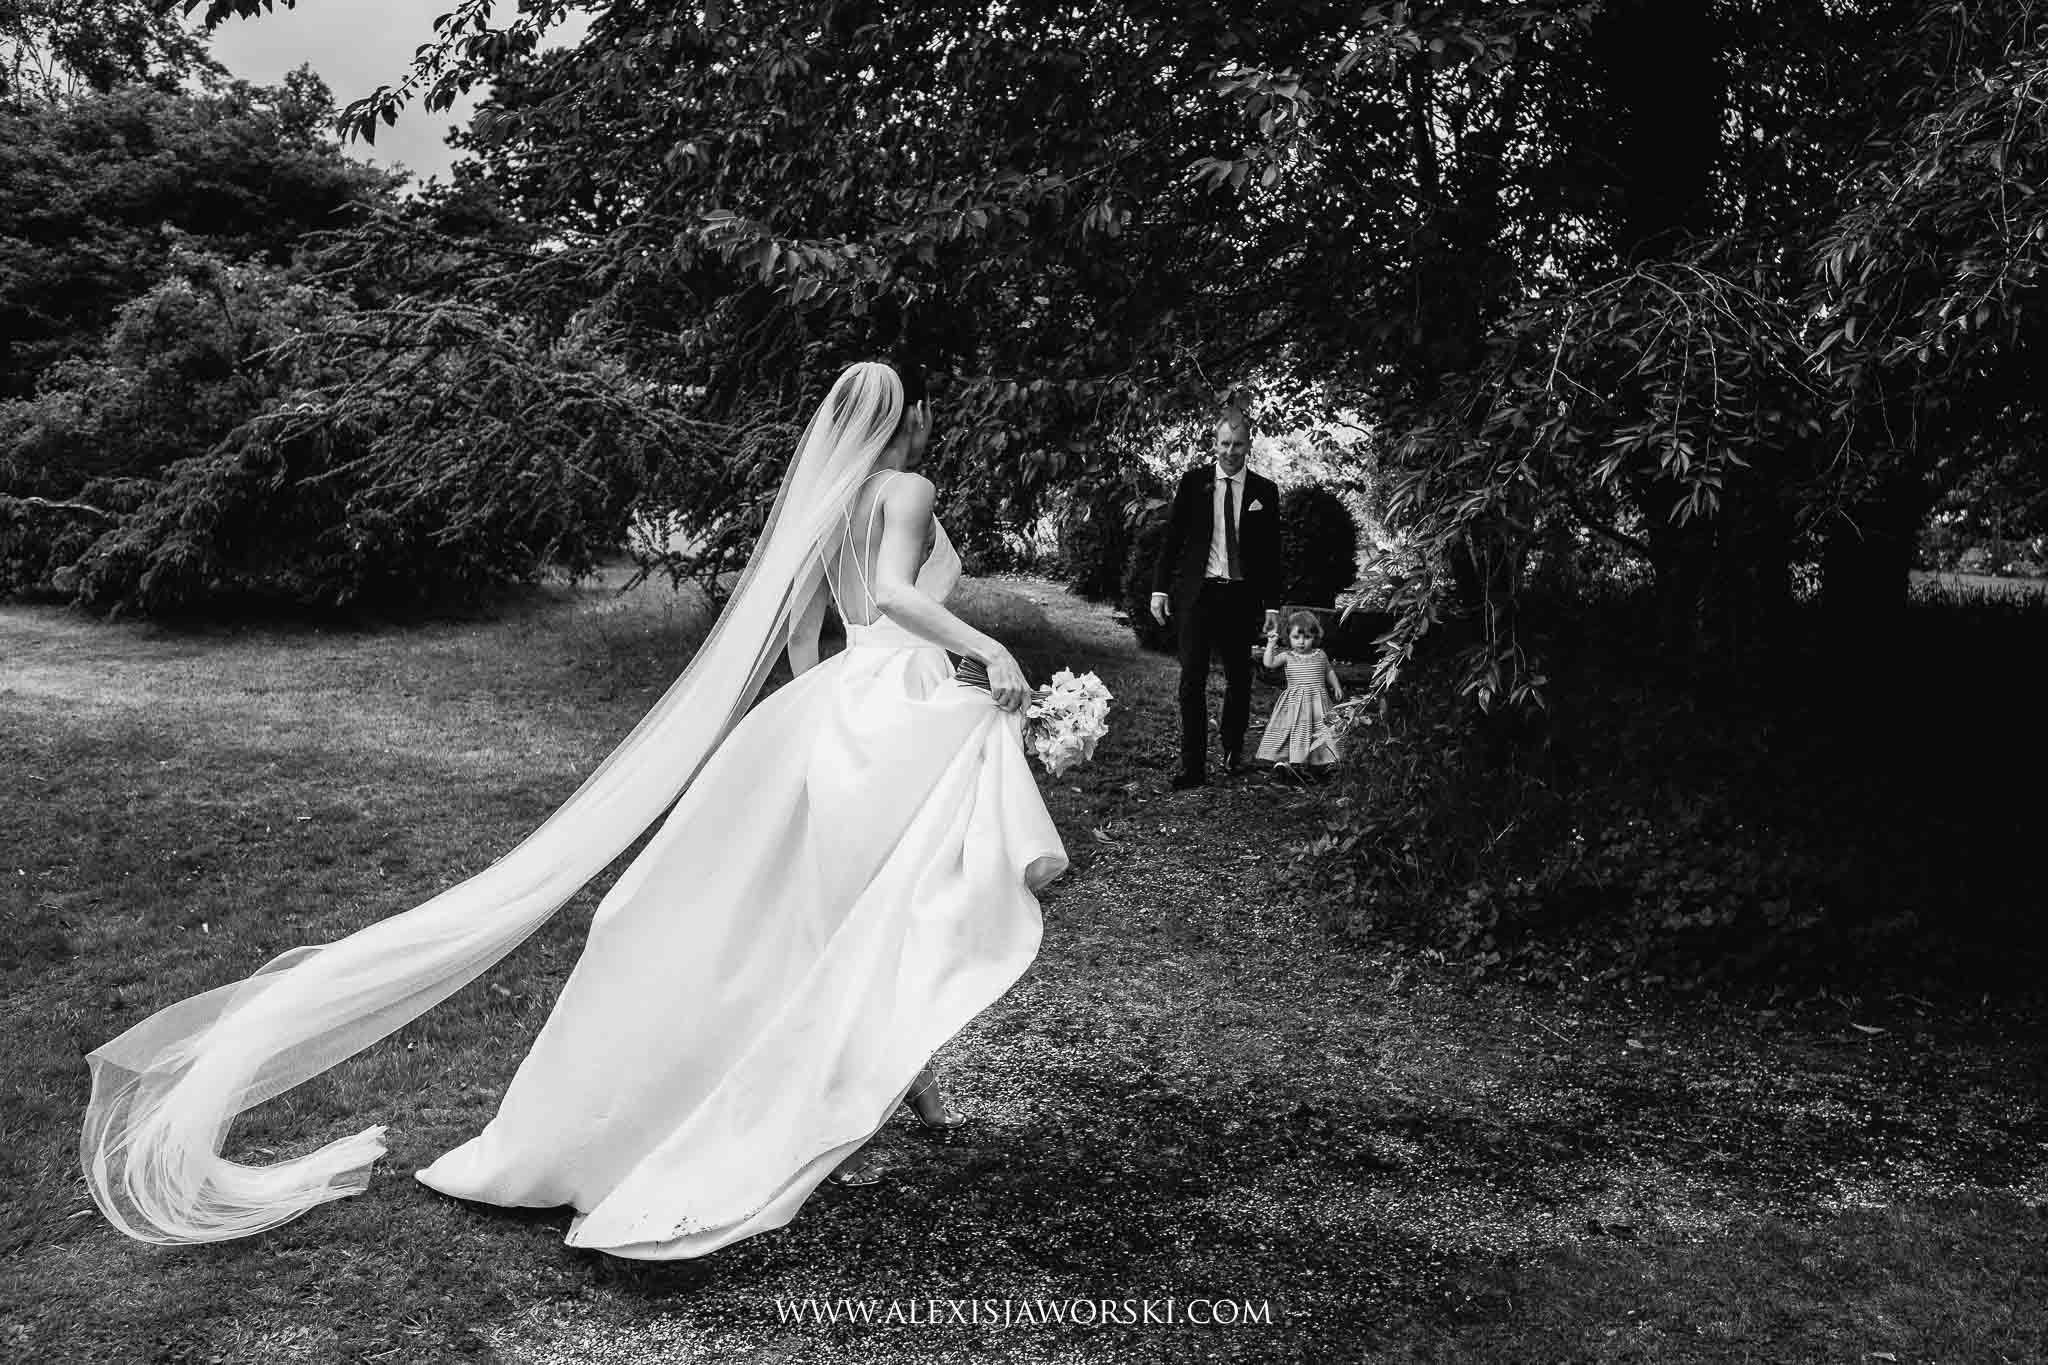 bride's veil floating